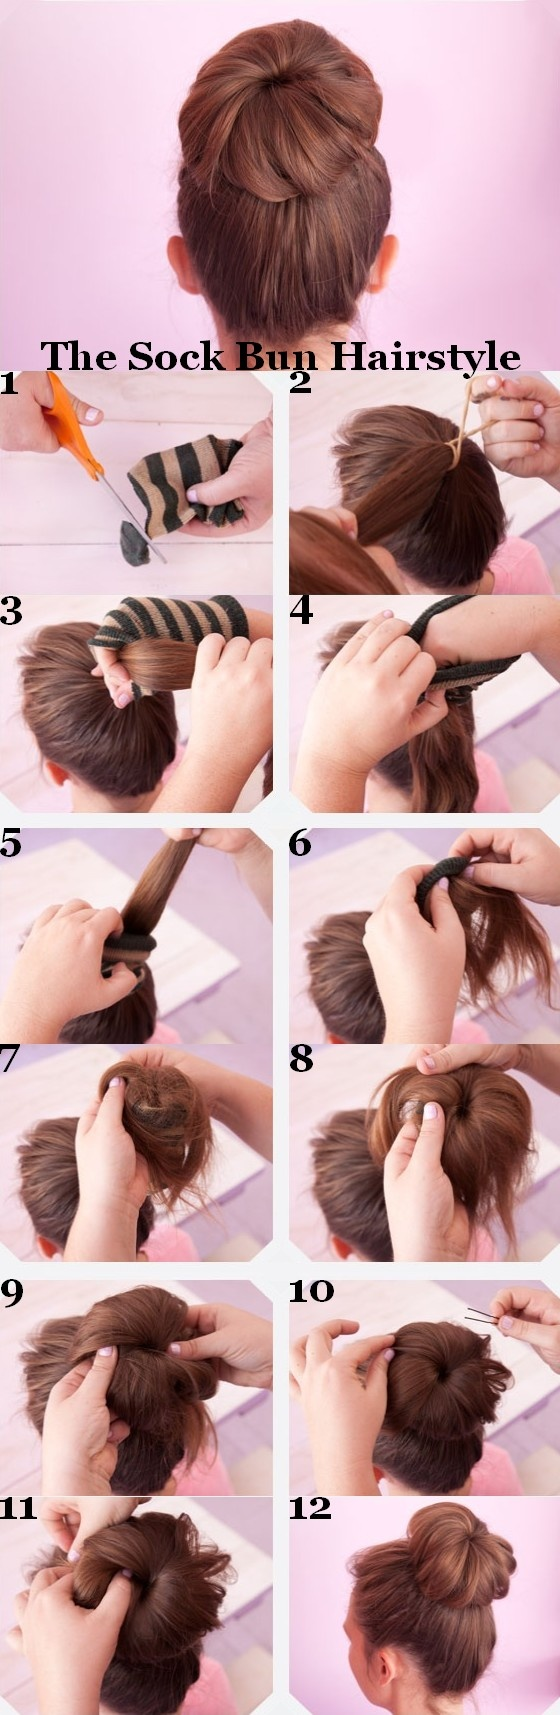 Fantastic 17 Charming Bun Hairstyles With Tutorials Pretty Designs Hairstyles For Women Draintrainus